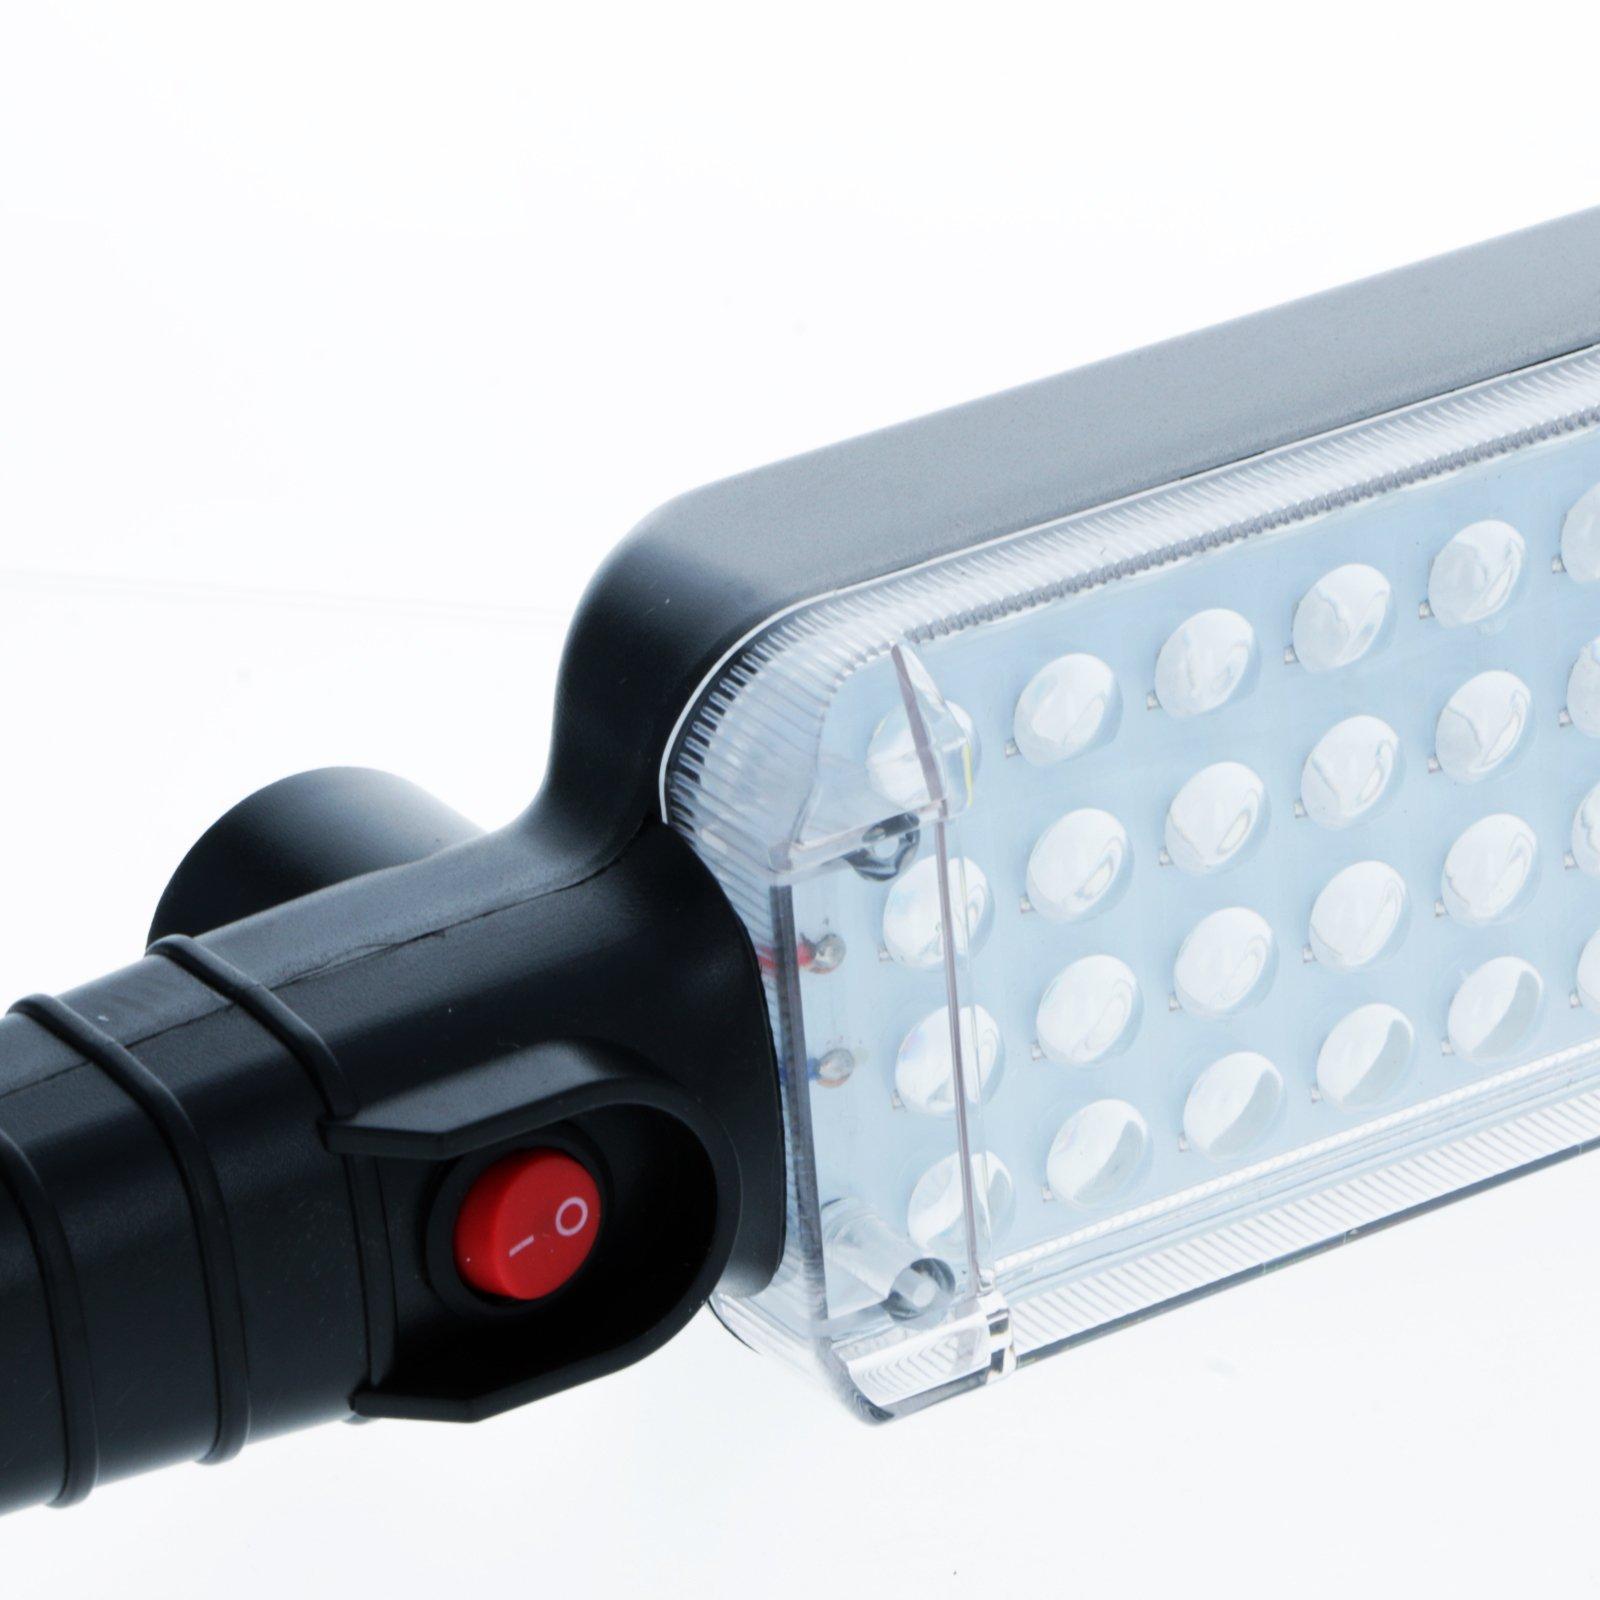 Universal - Heavy-Duty Work Light - 500 Lumen 34 x SMD LED - 10 Watt